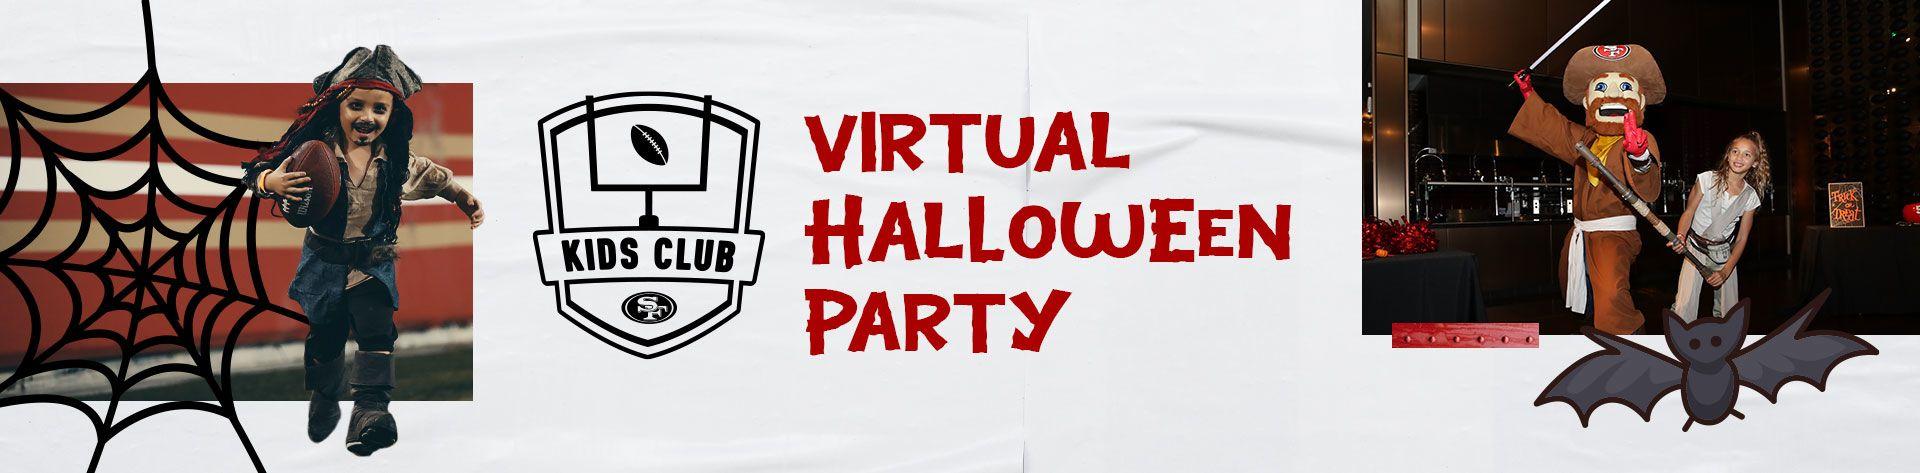 KidsClubVirtualHalloween_WEB-HEADER